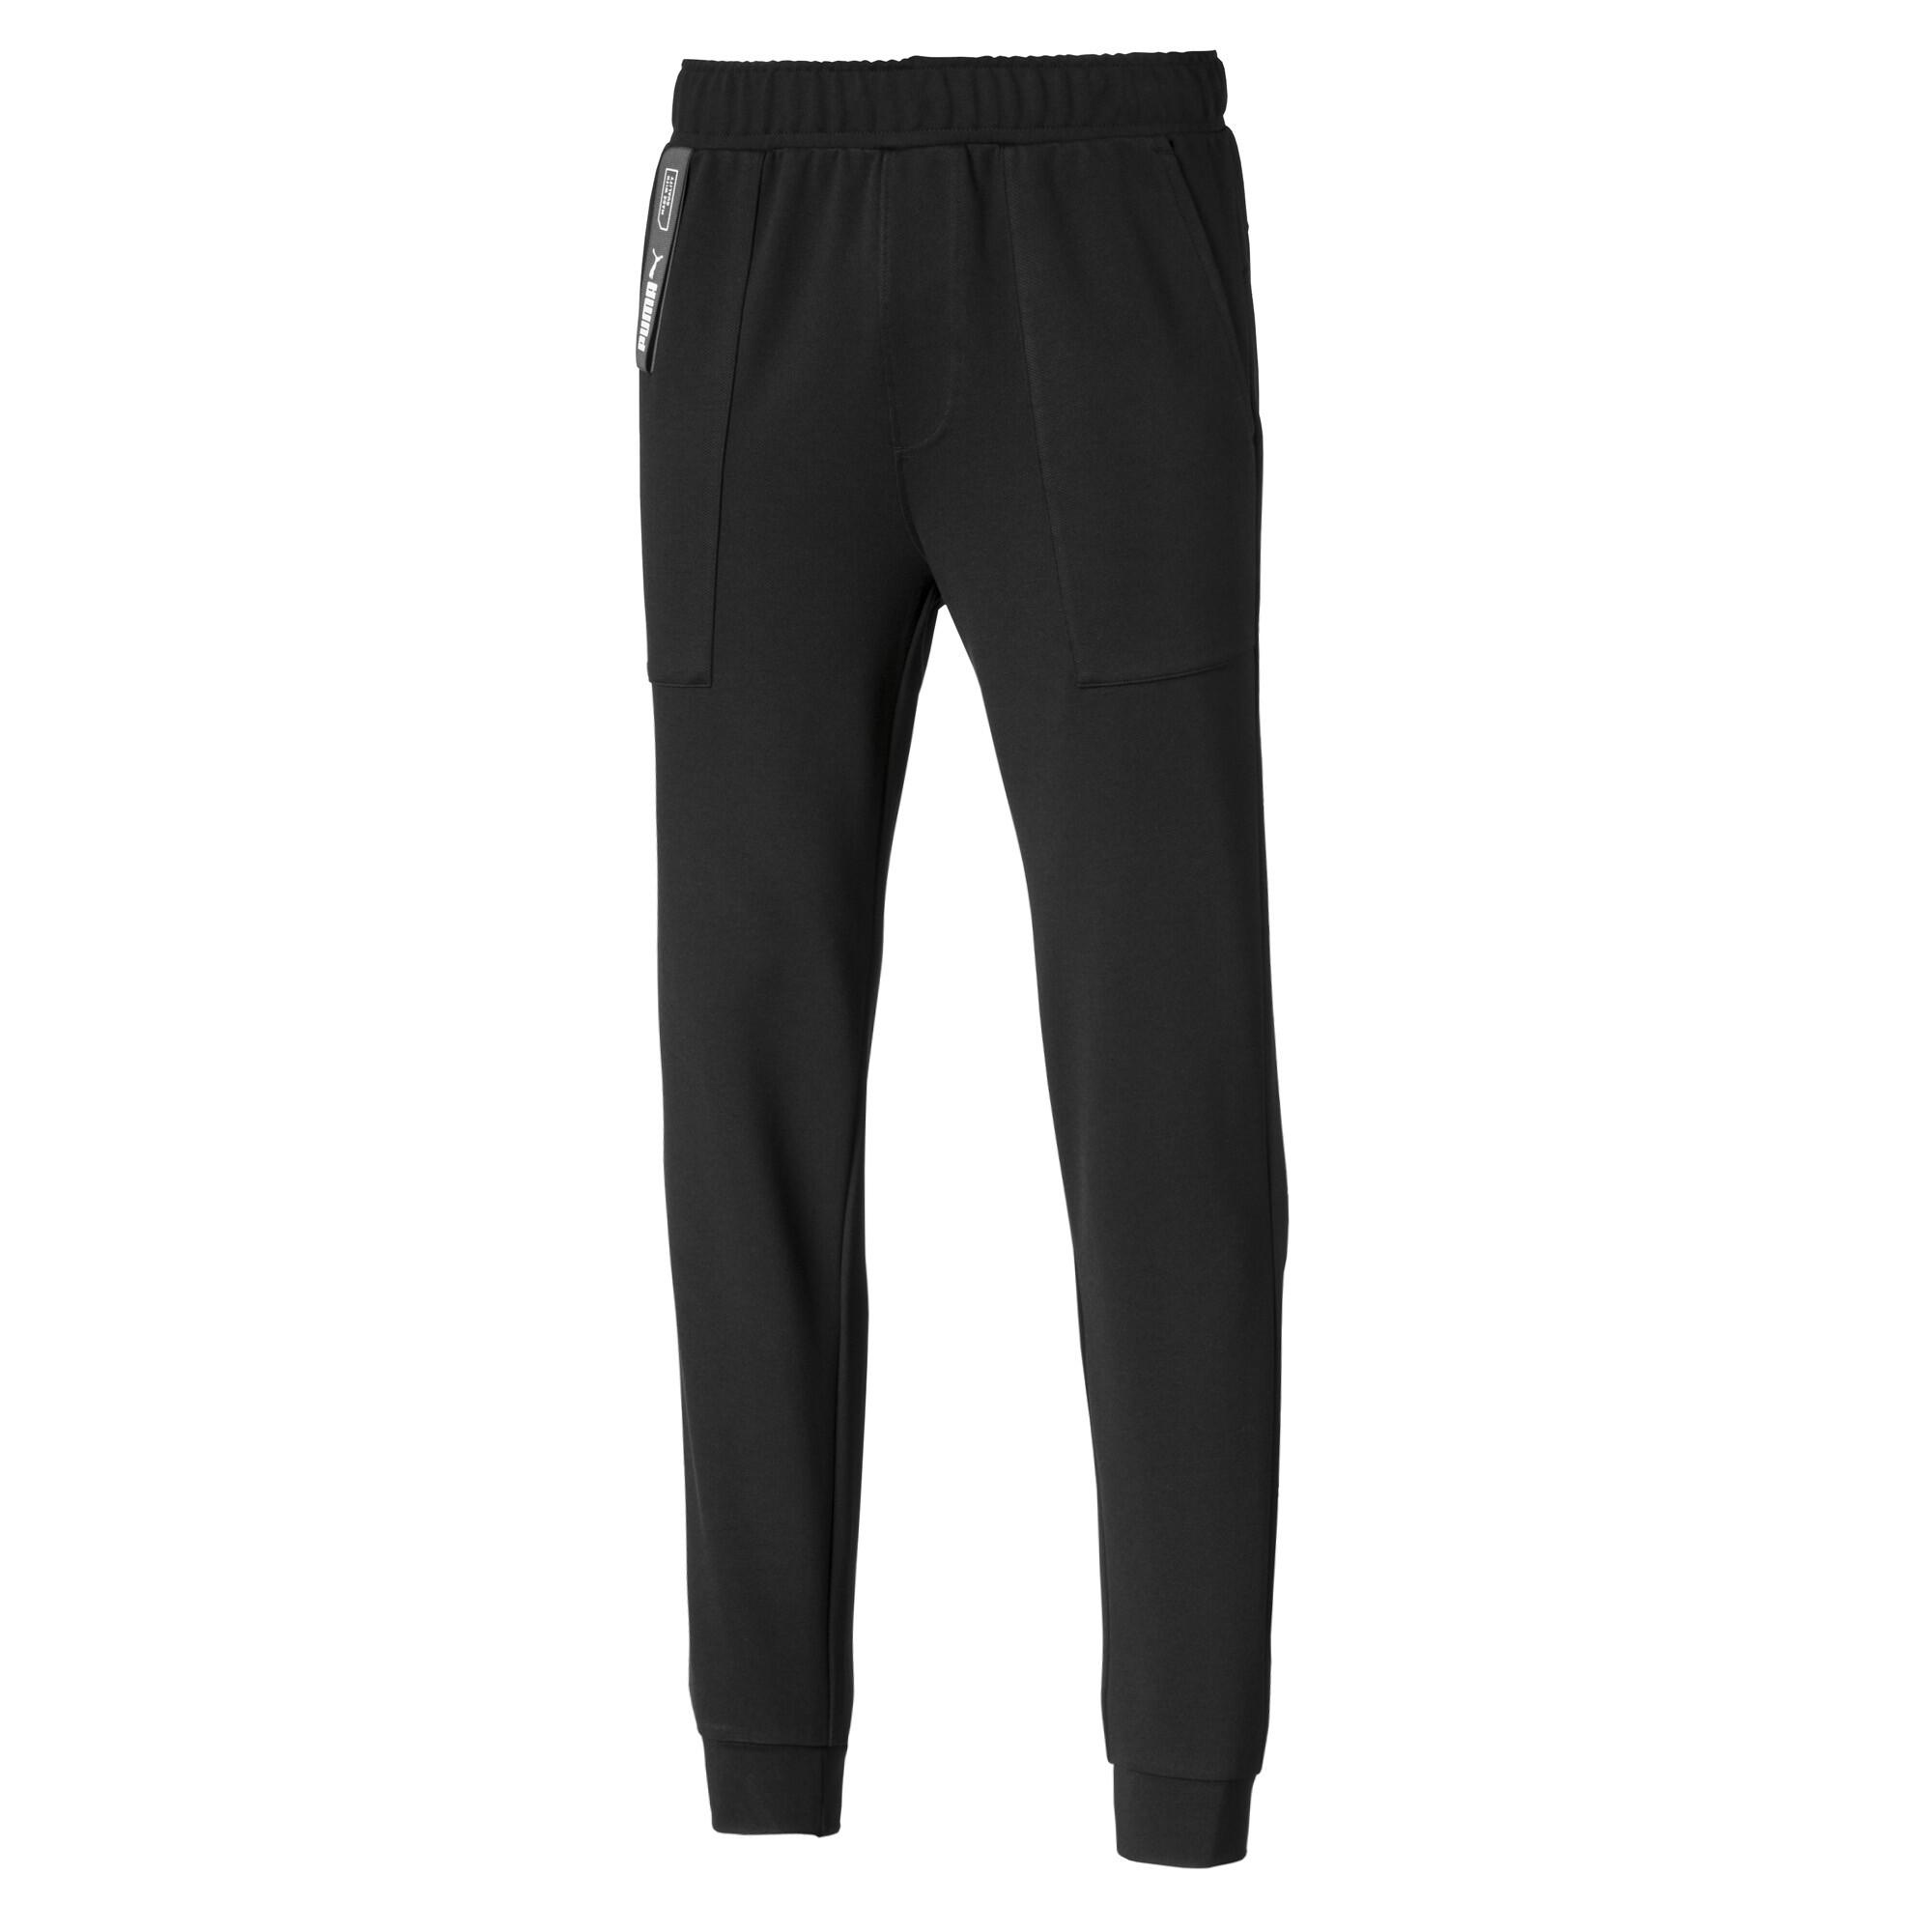 PUMA-NU-TILITY-Men-039-s-Sweatpants-Men-Knitted-Pants-Basics thumbnail 17